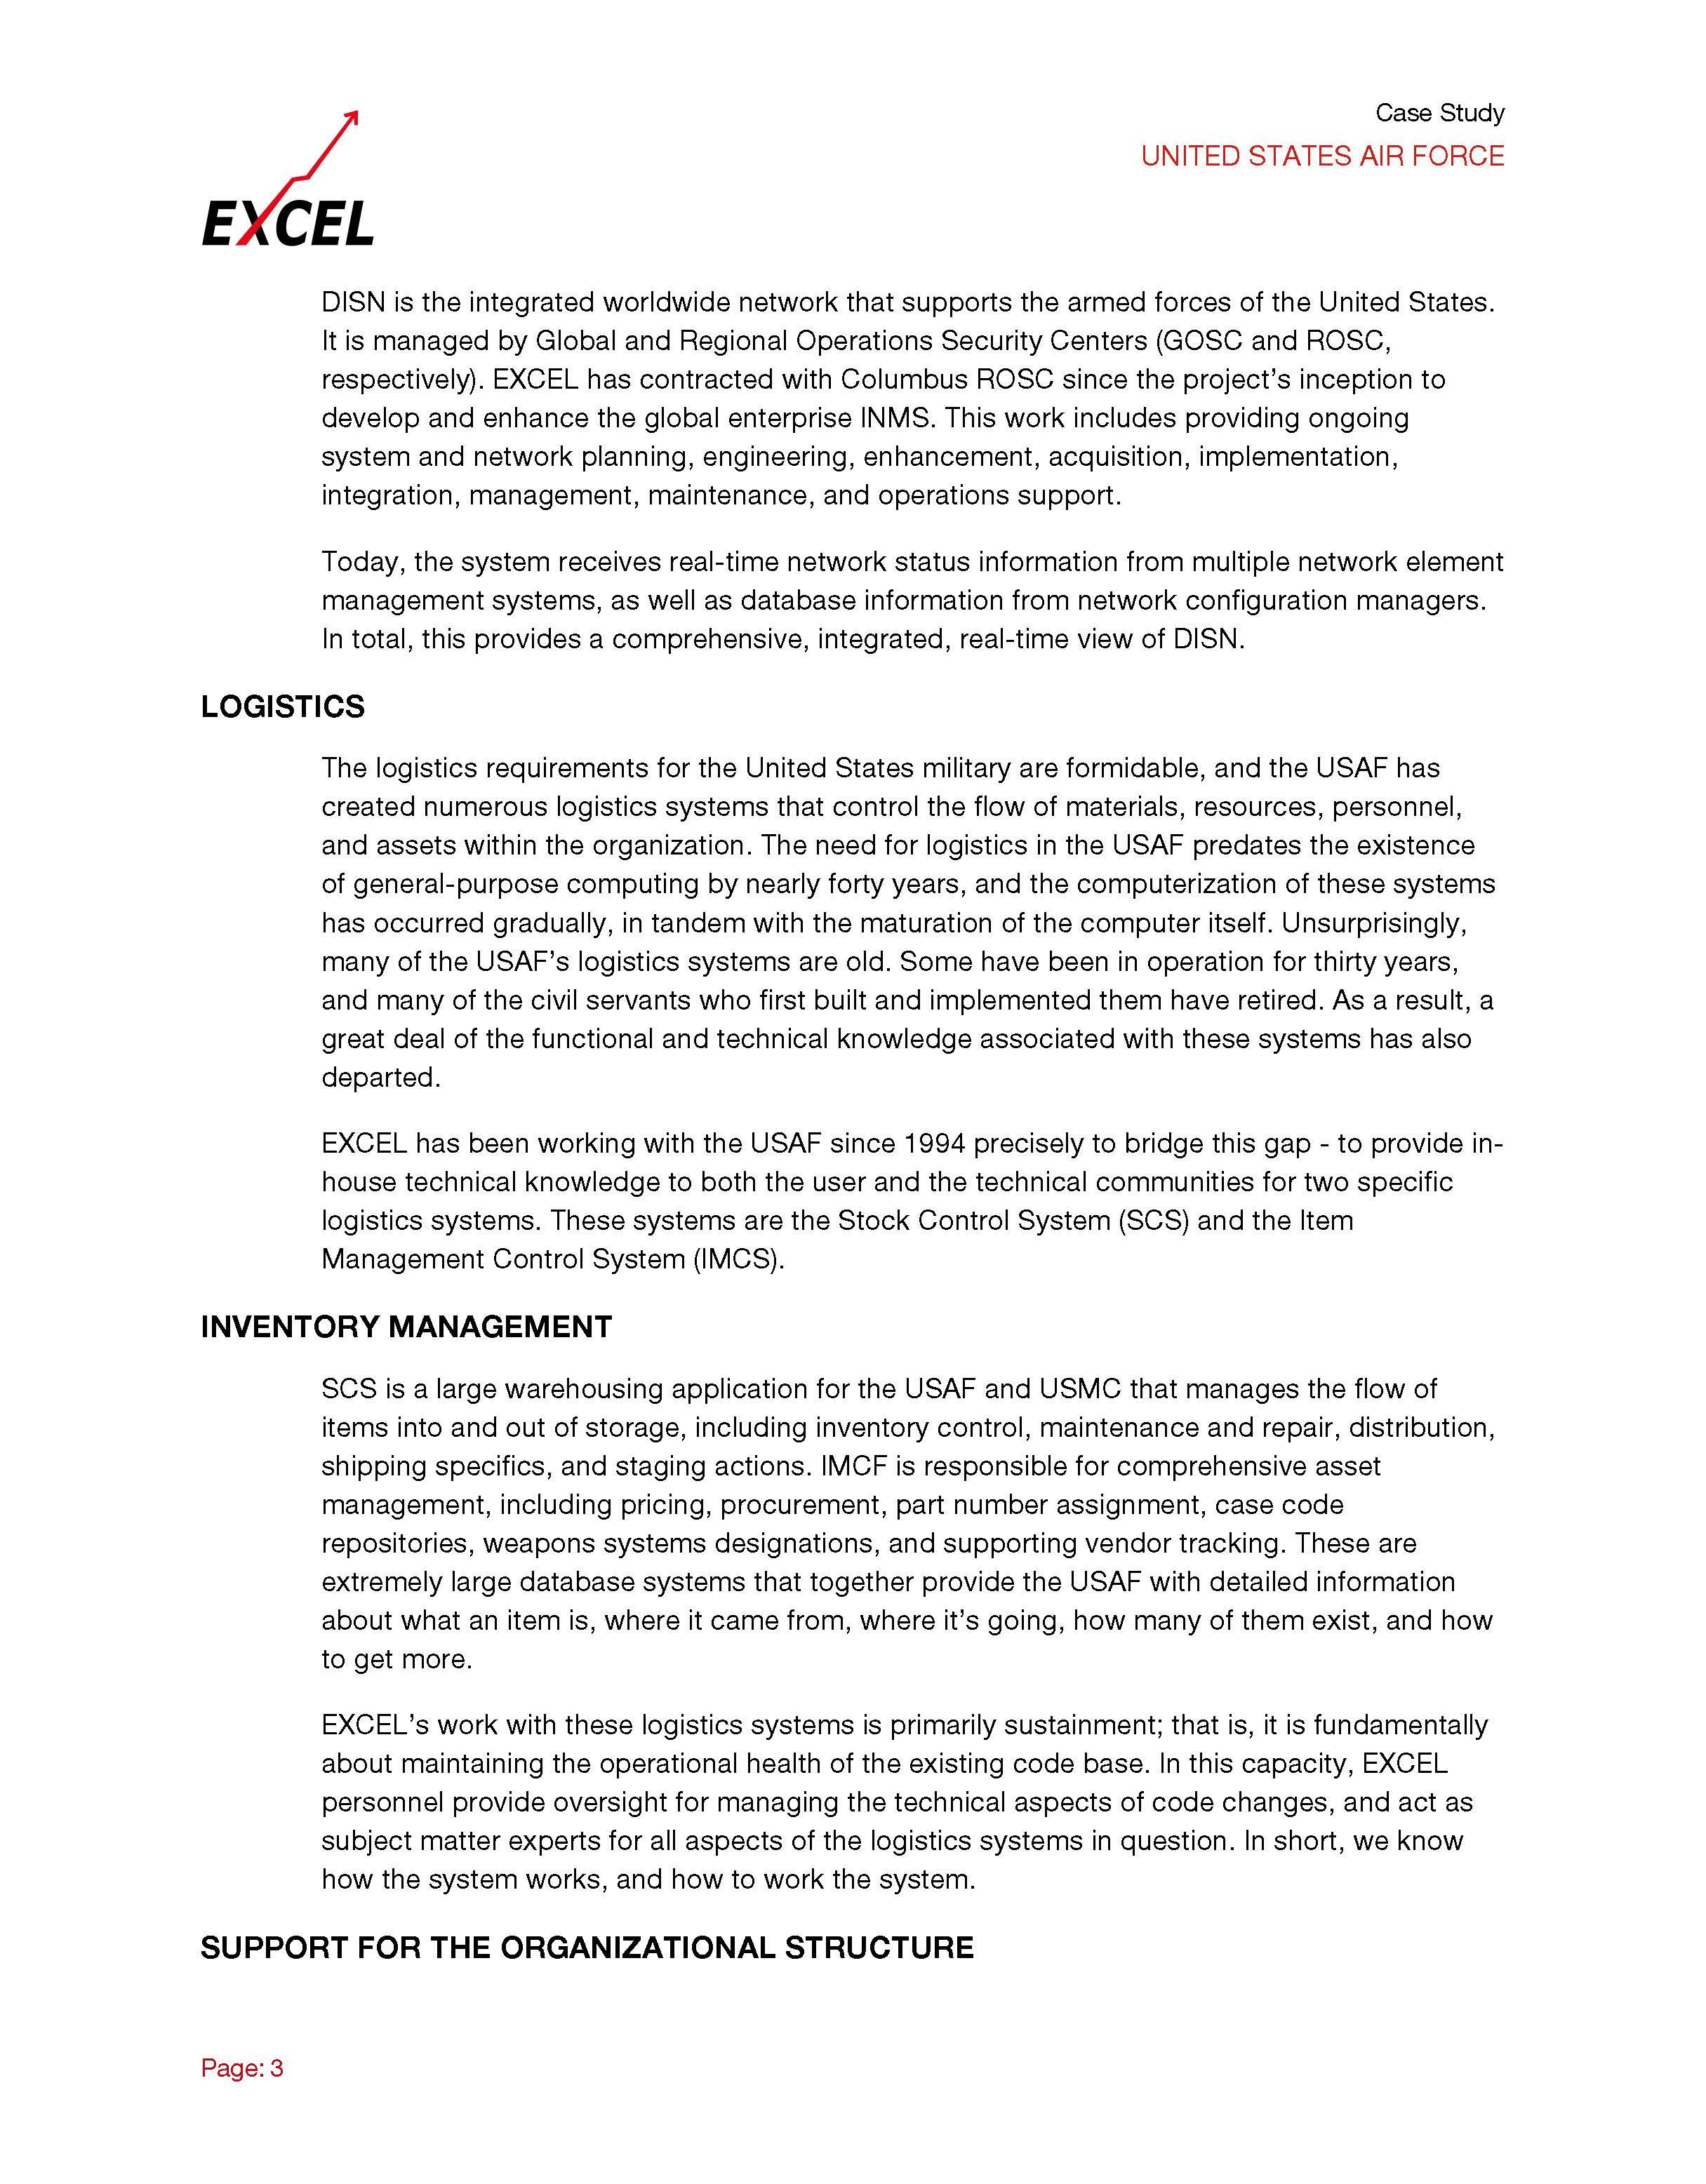 Case Study - USAF_Page_3.jpg